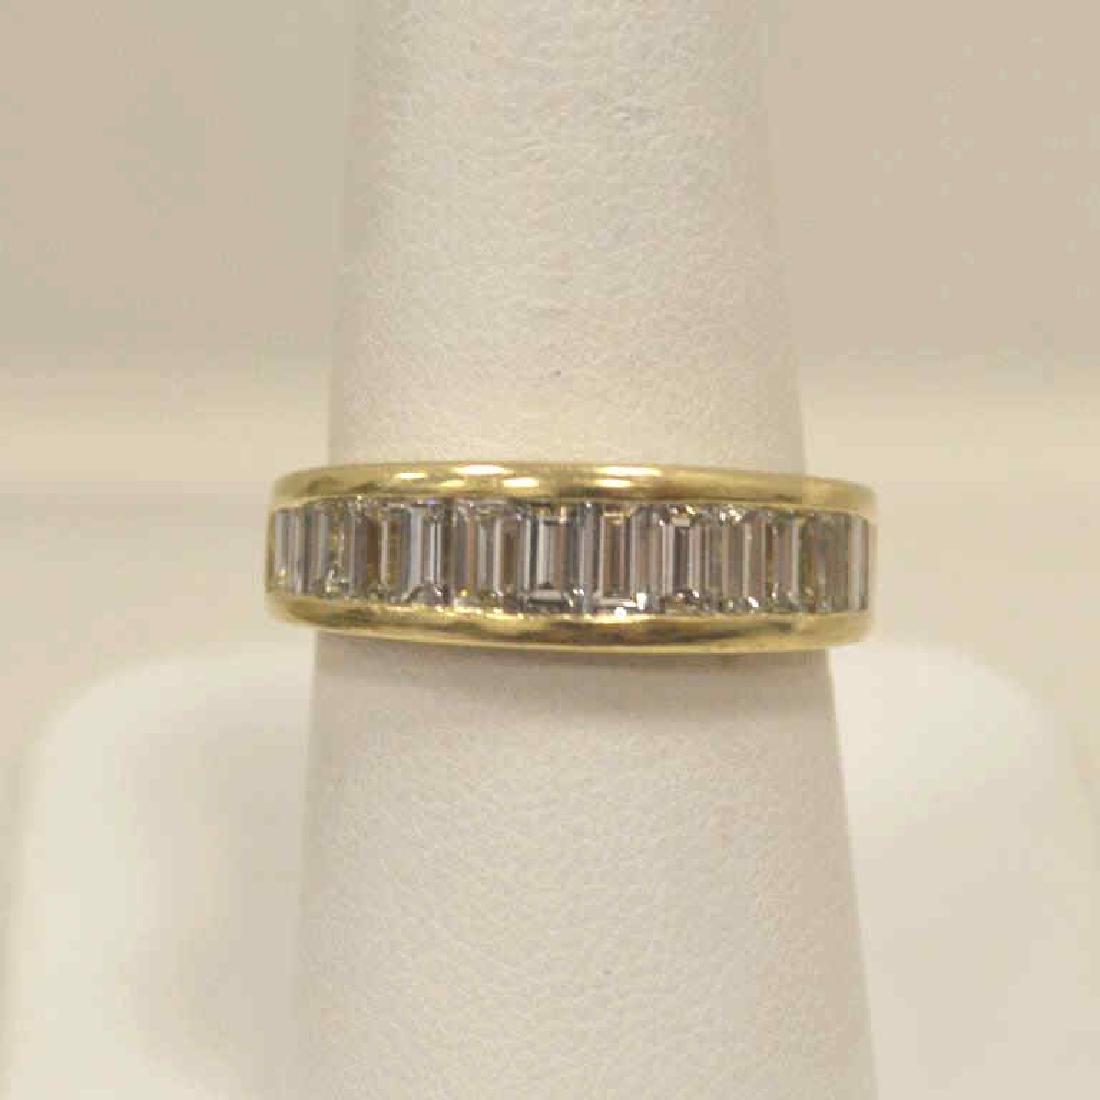 14kt yellow gold diamond wedding band